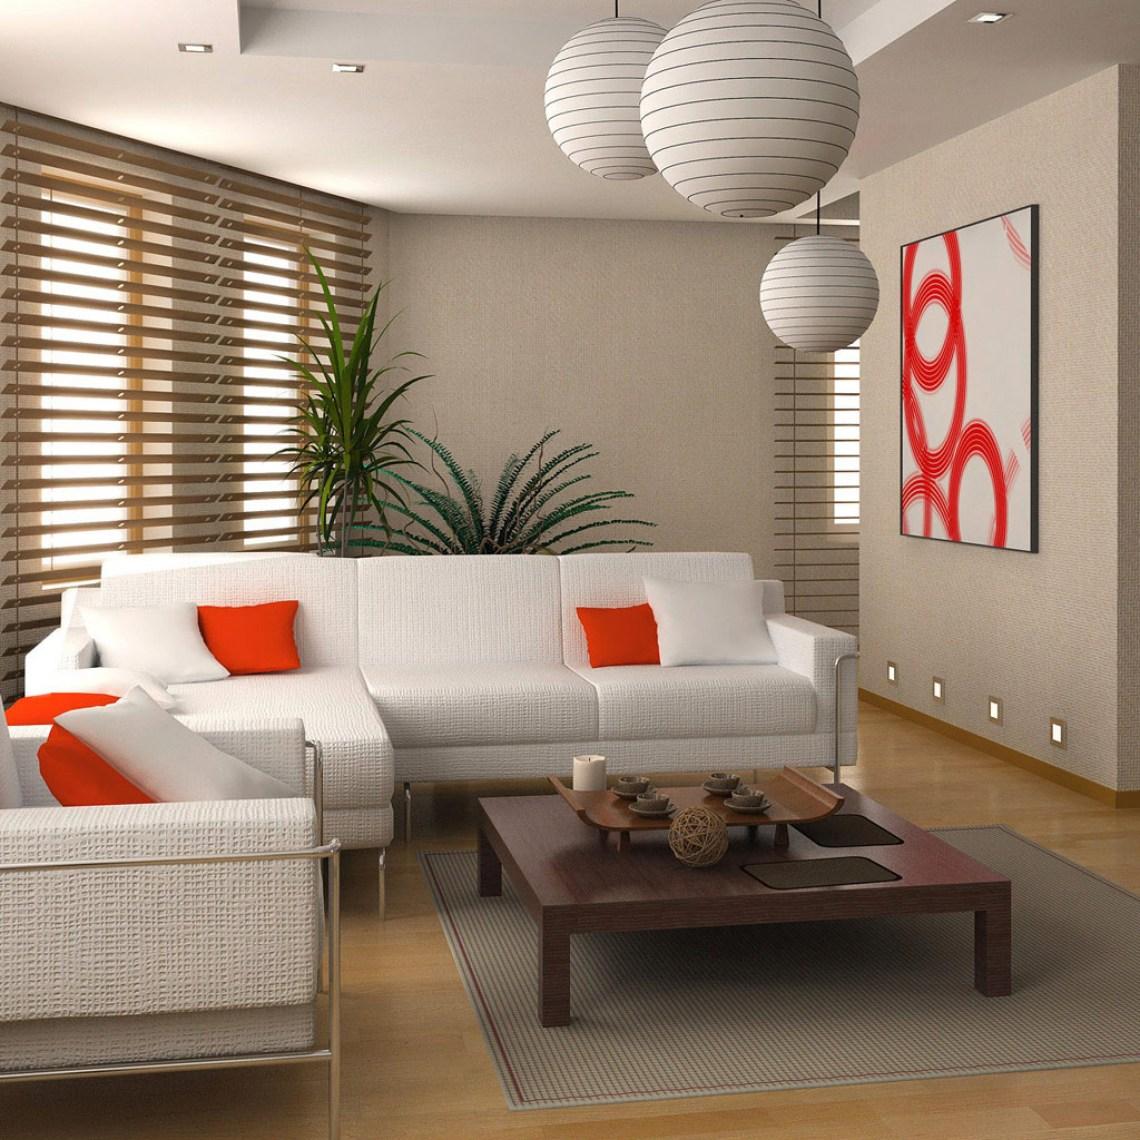 Miscellaneous Modern Living Room Interior Design Ideas